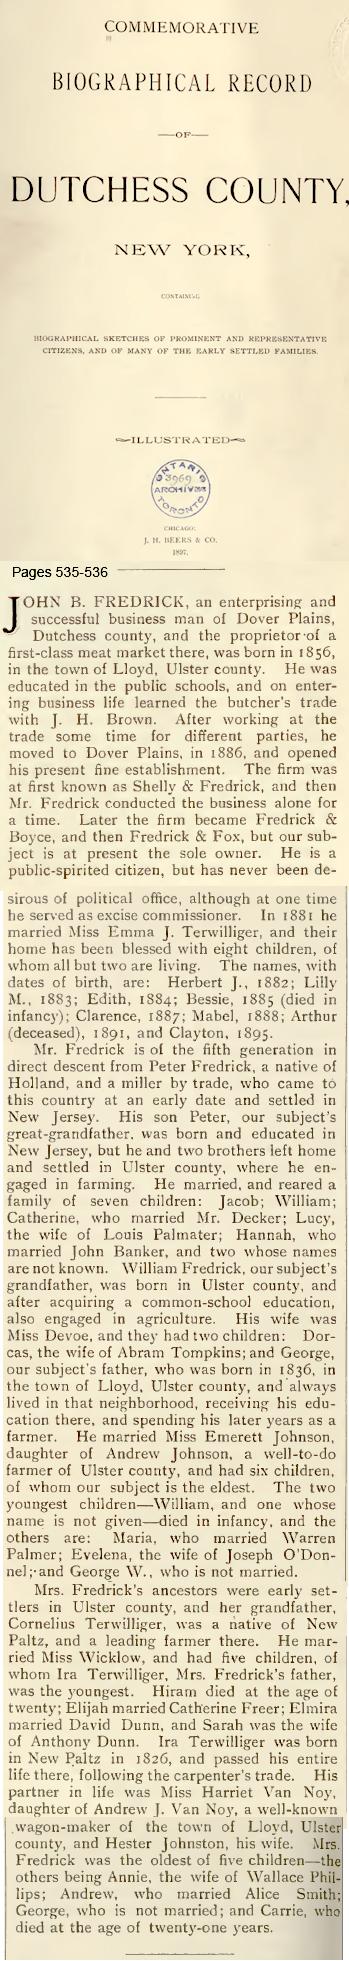 George W Frederick